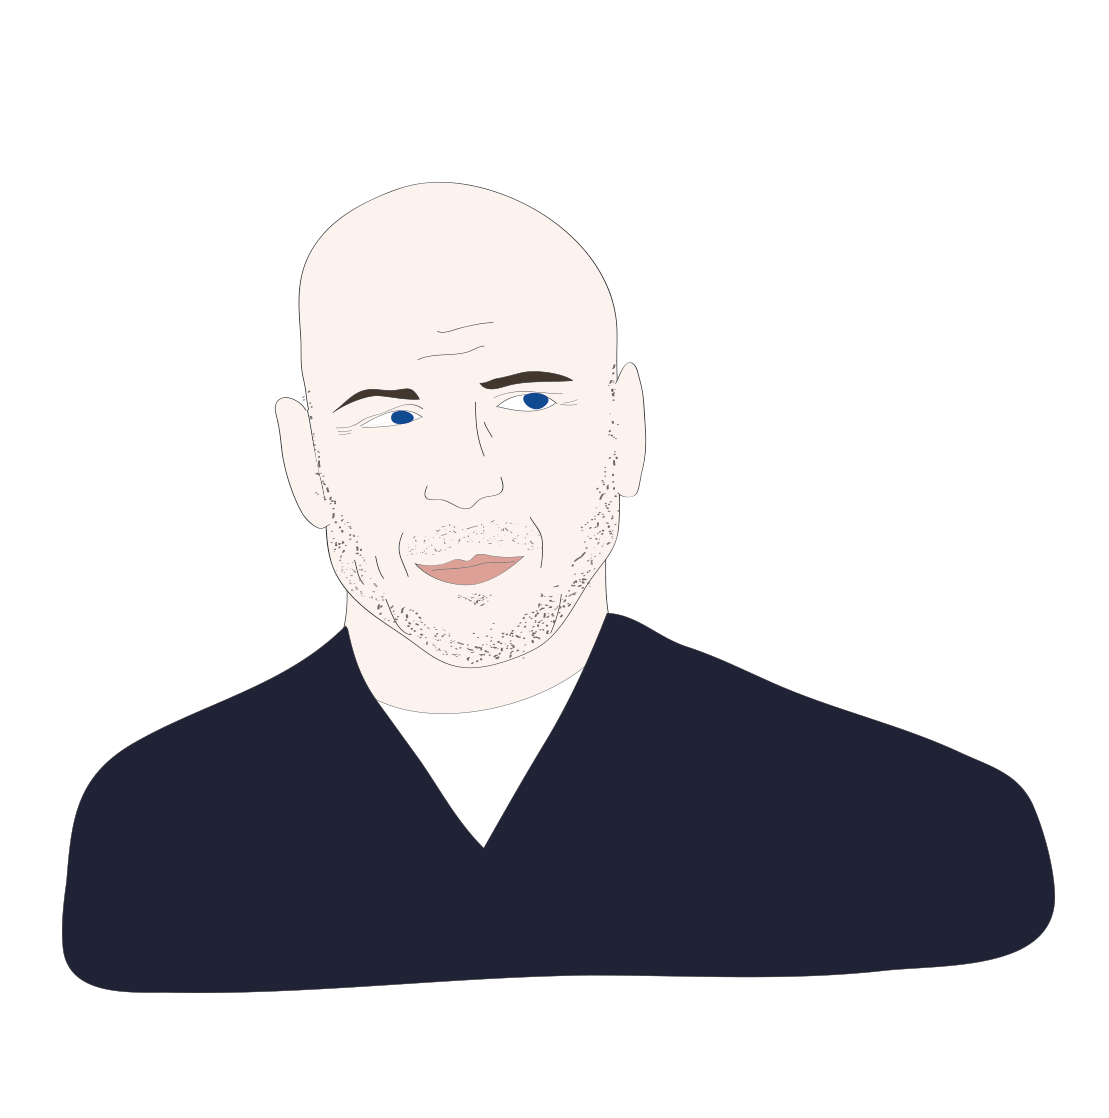 Bruce Willis illustration